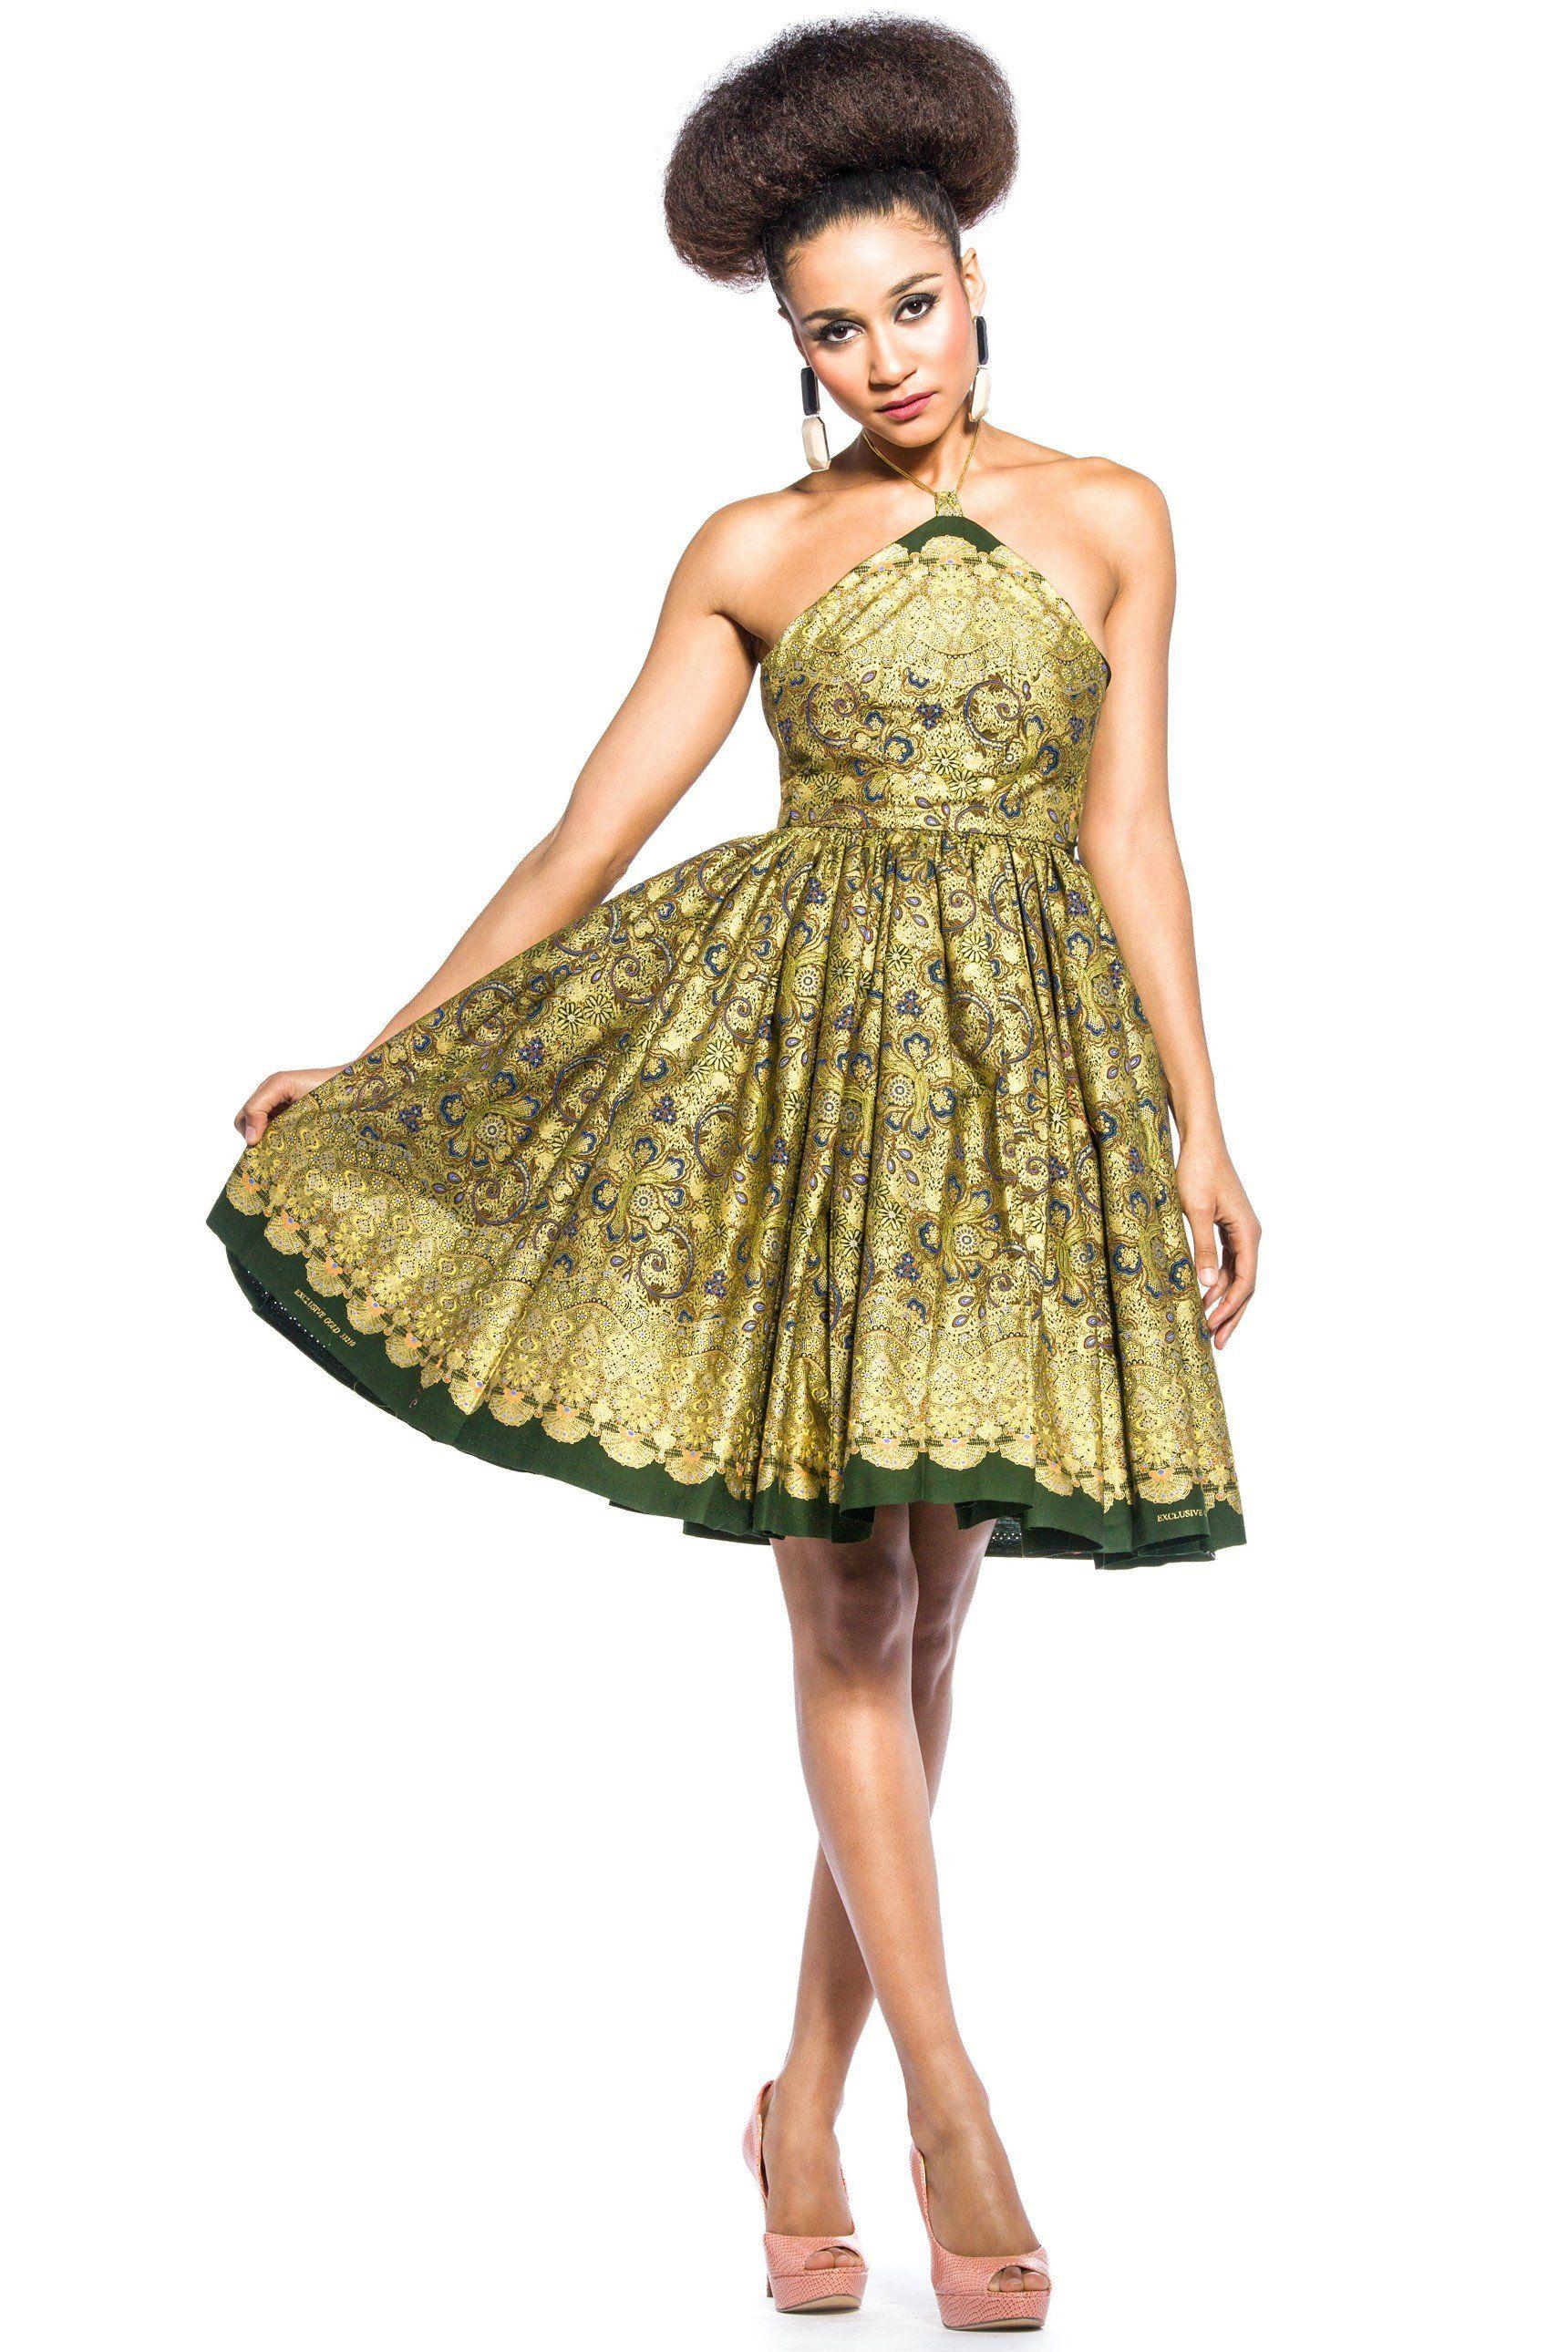 Xhosa wedding decor ideas  Mimi Dress  Collection and Shopping